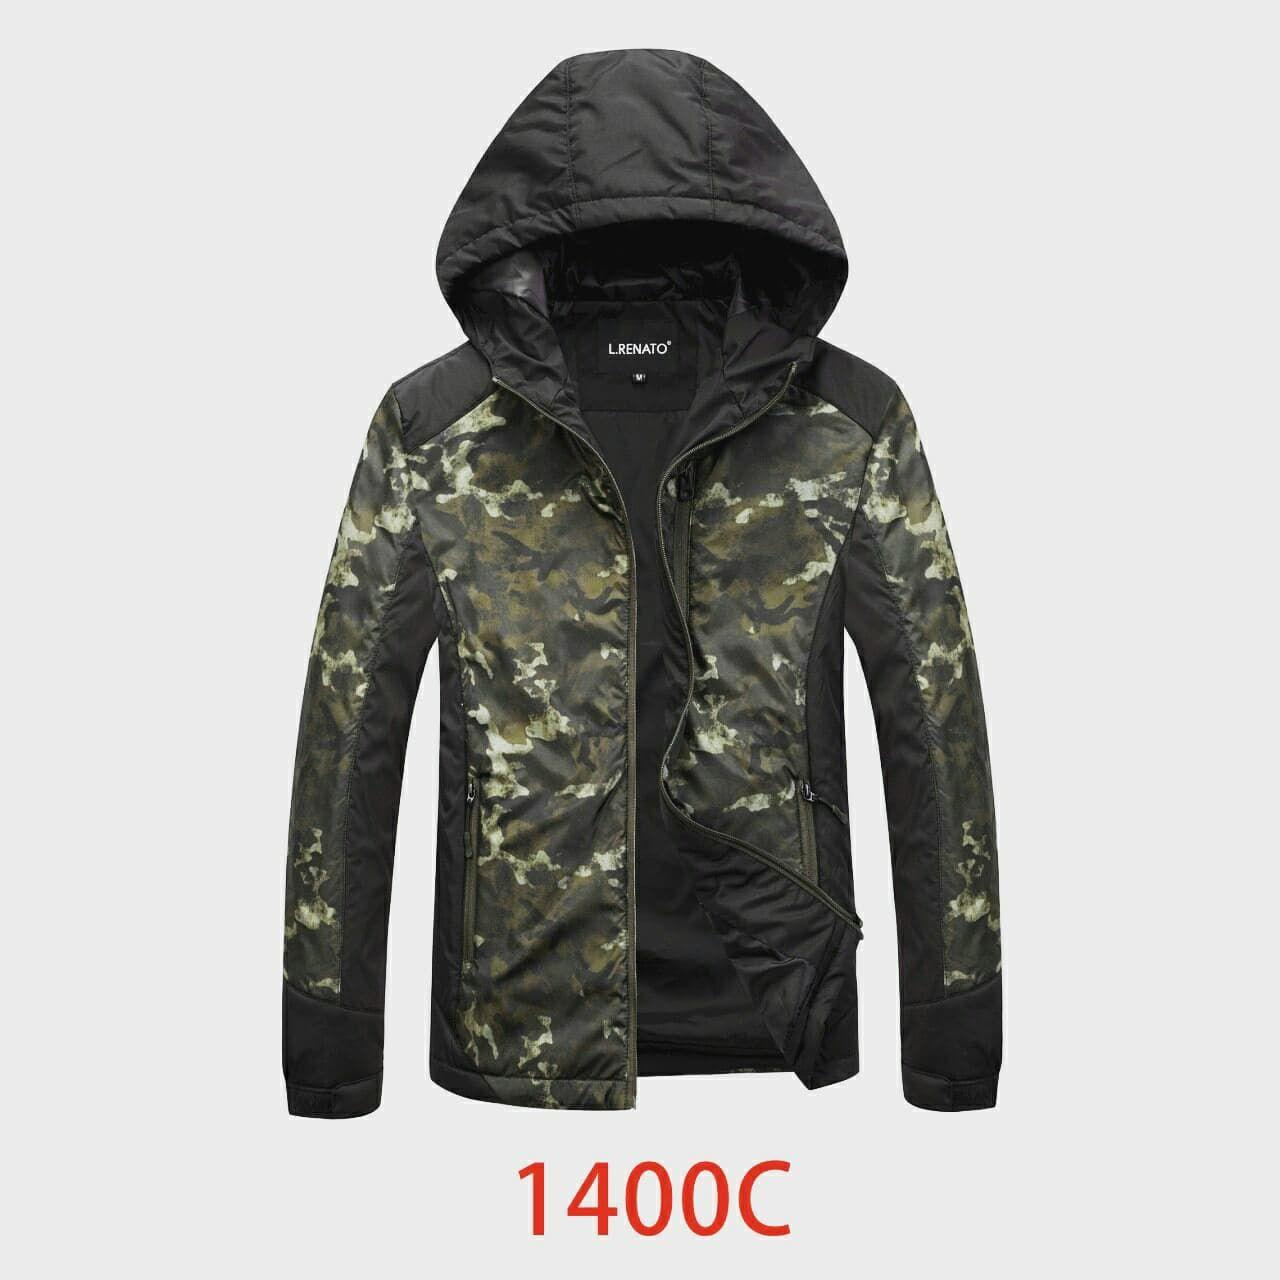 Meska Kurtka Moro Z Kapturem Wiosenna Kurtka S 7211234198 Oficjalne Archiwum Allegro Jackets Leather Jacket Fashion